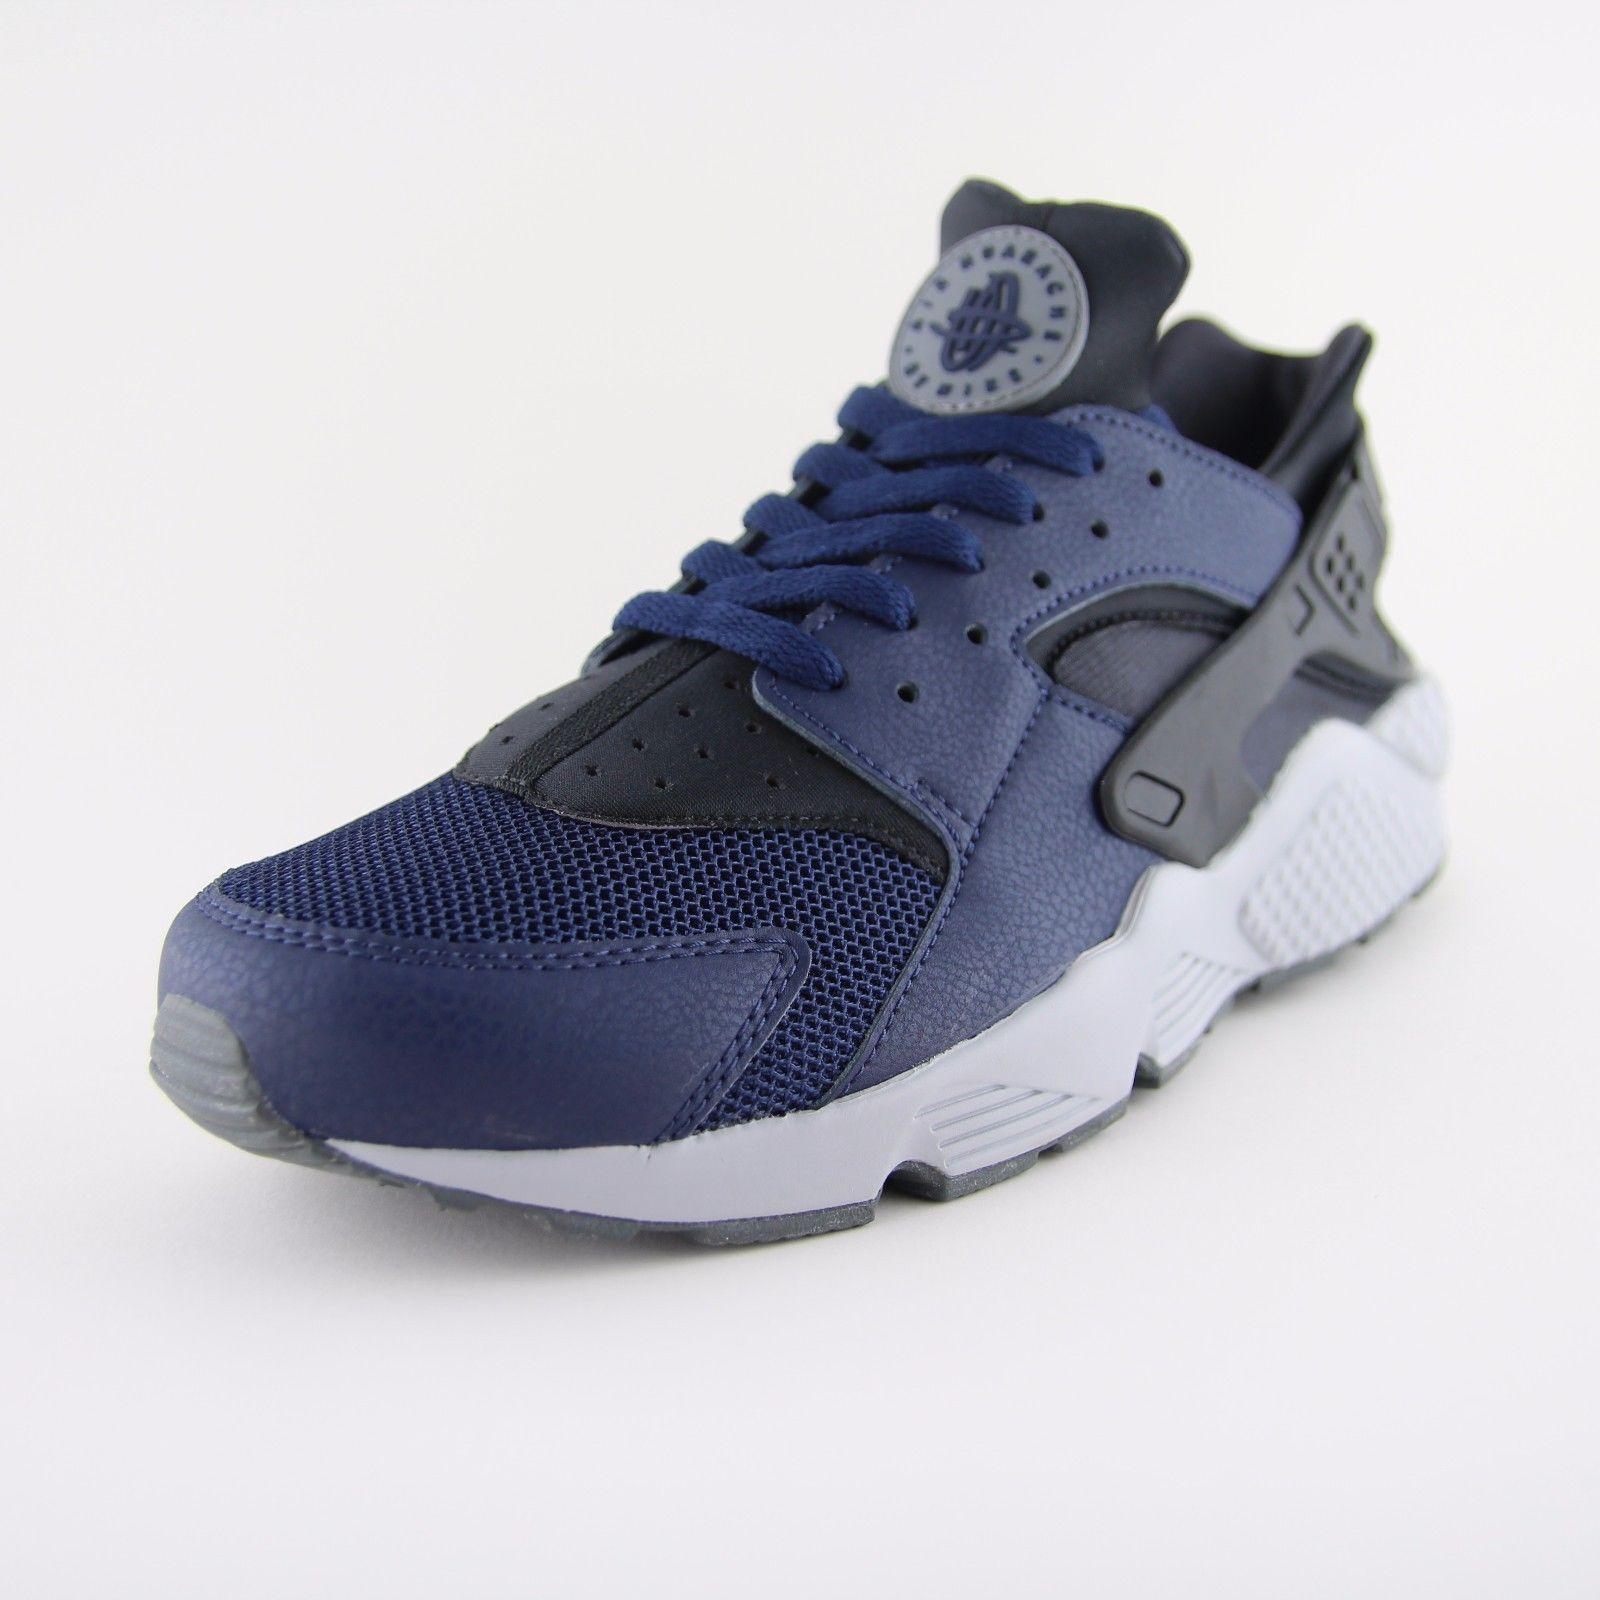 Nike air huarache marina / bianchi 409 taglia 9 nuove 318429 409 bianchi 7420e6